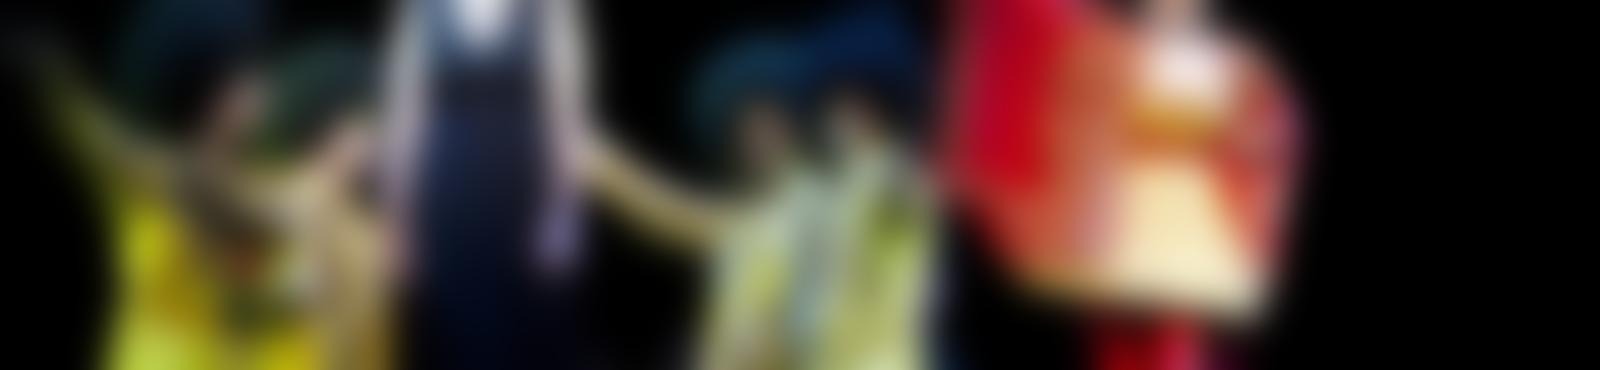 Blurred 70cd4a63 9905 46f0 ba61 75af4436b5c7